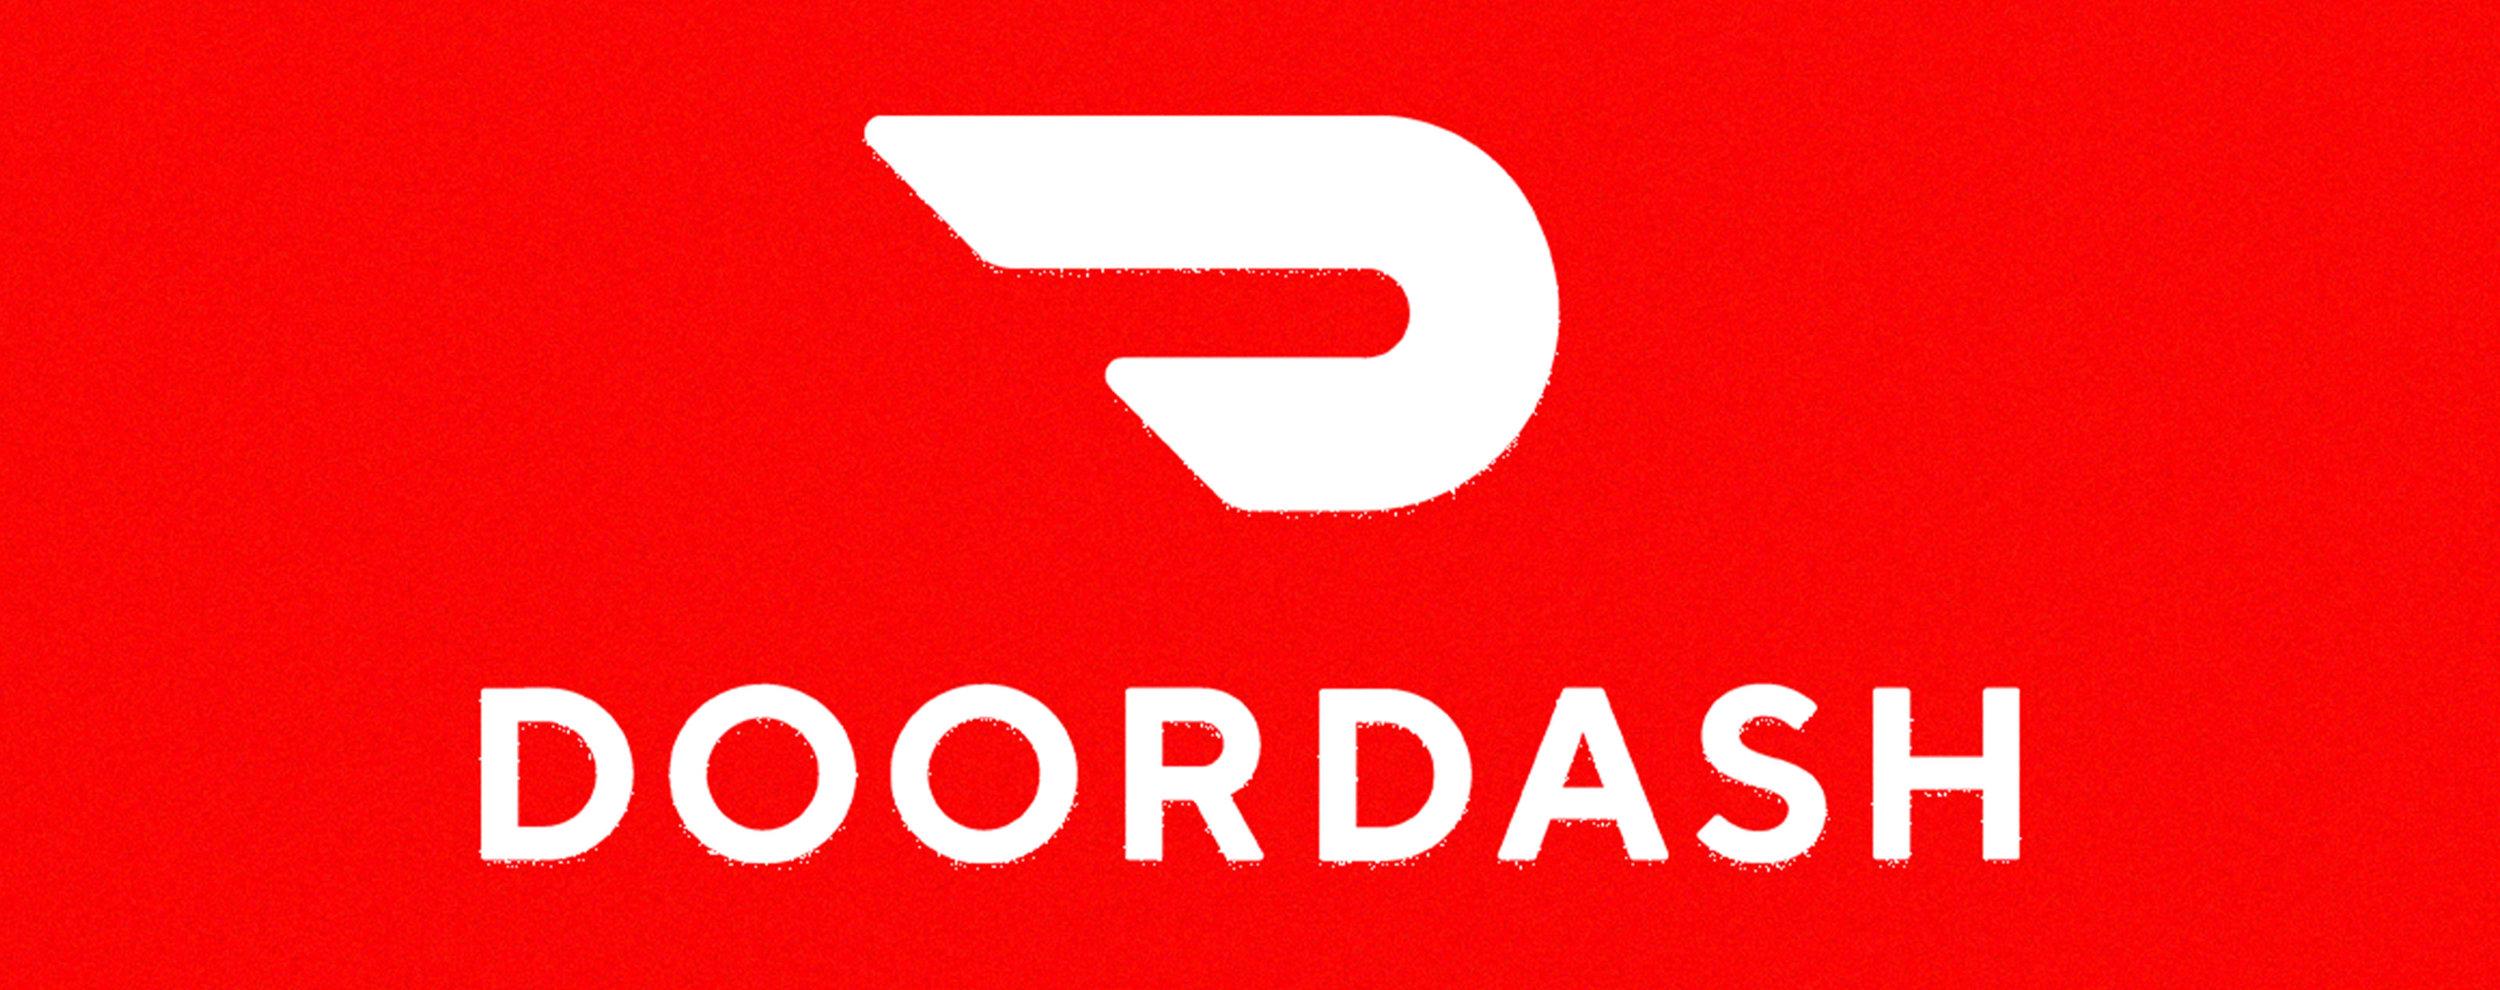 Doordash_web.jpg